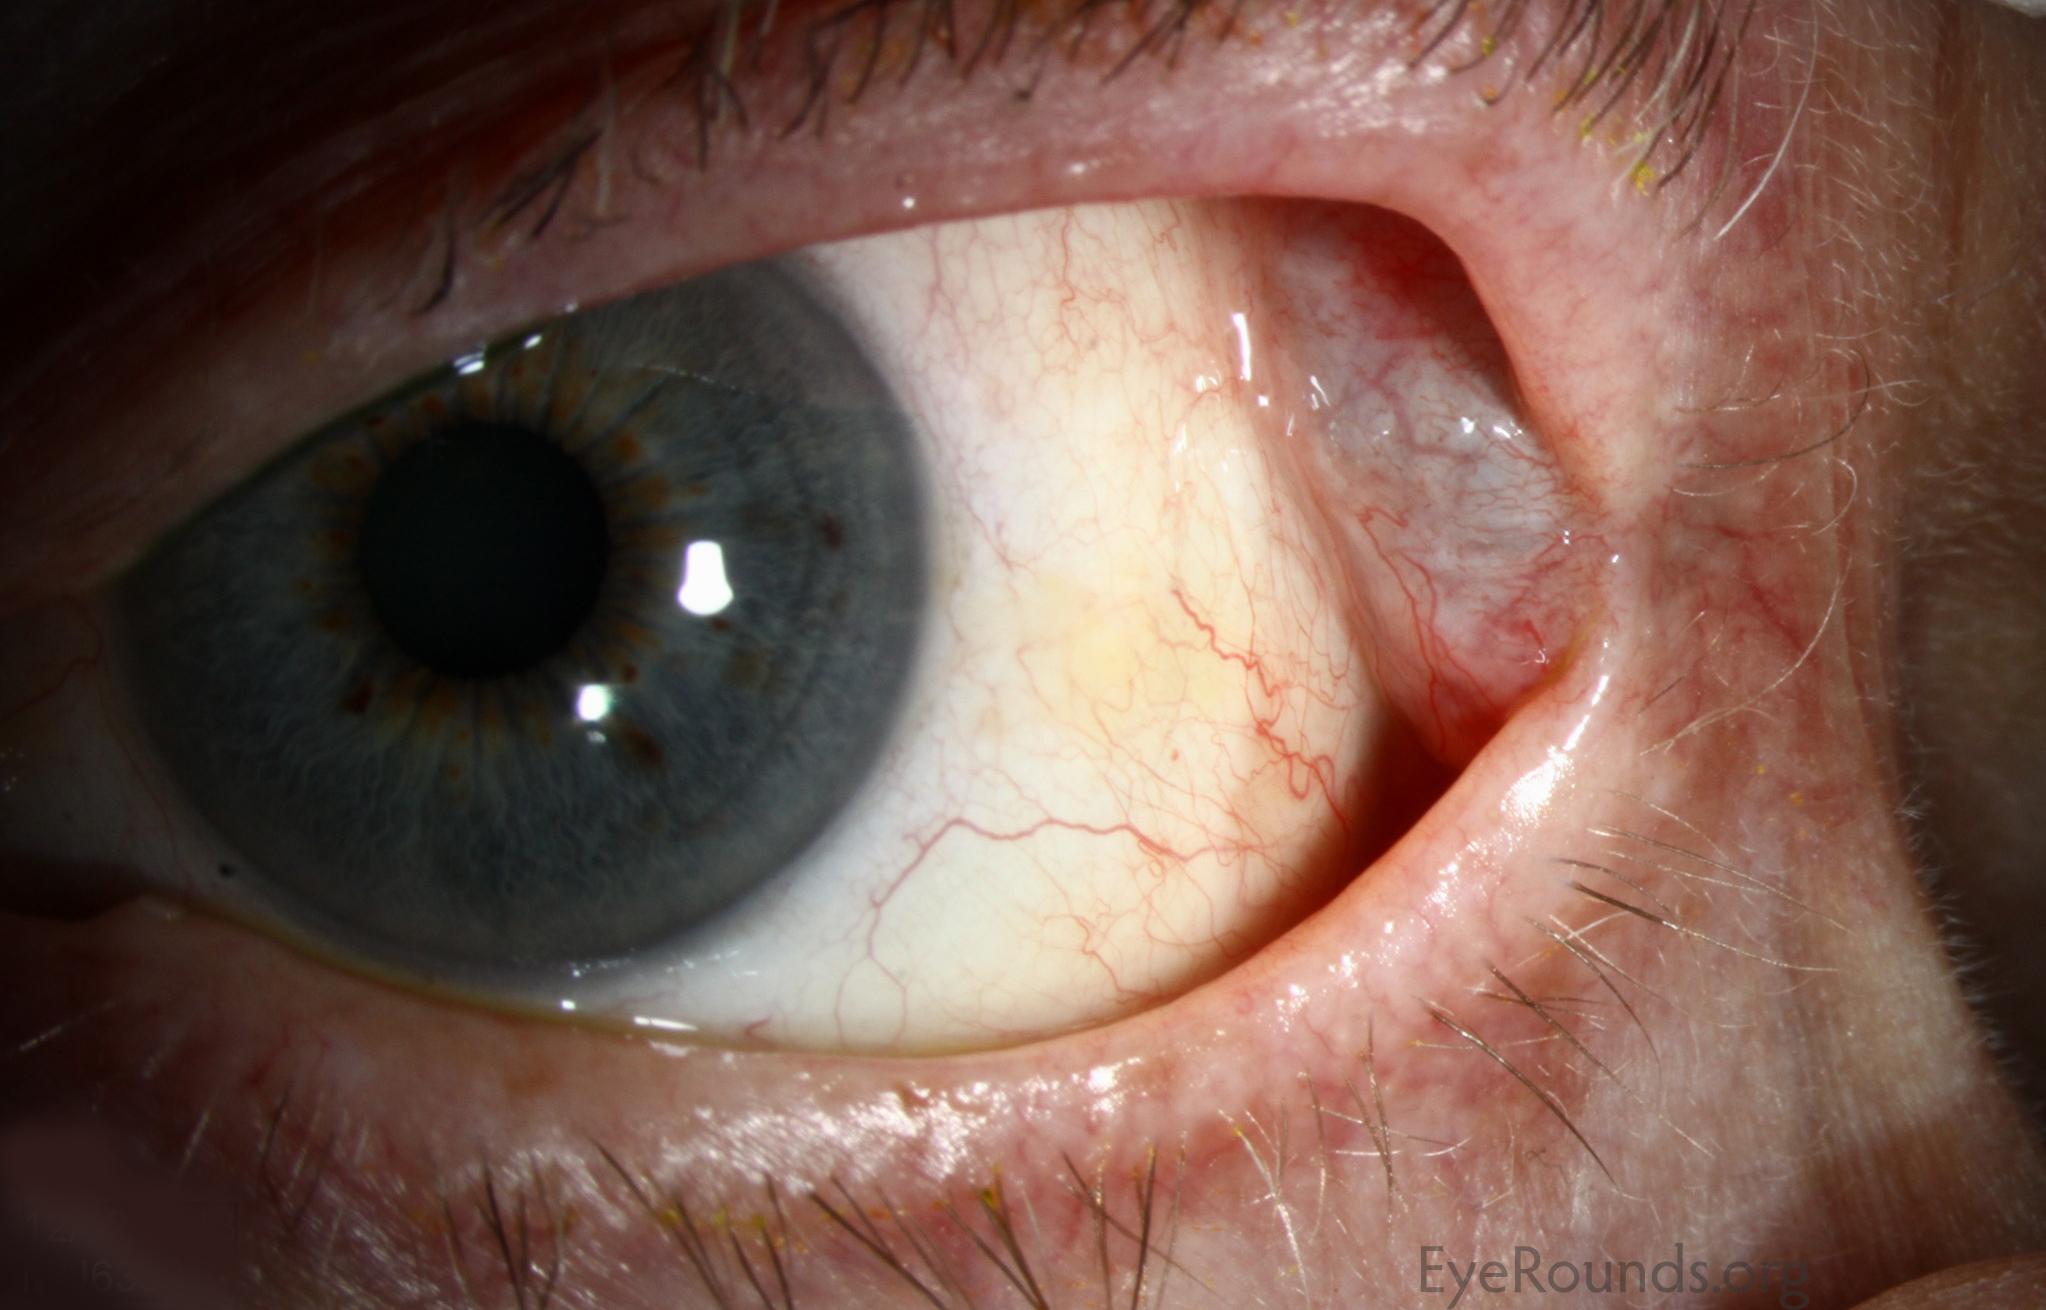 Lacrimal gland dacryops